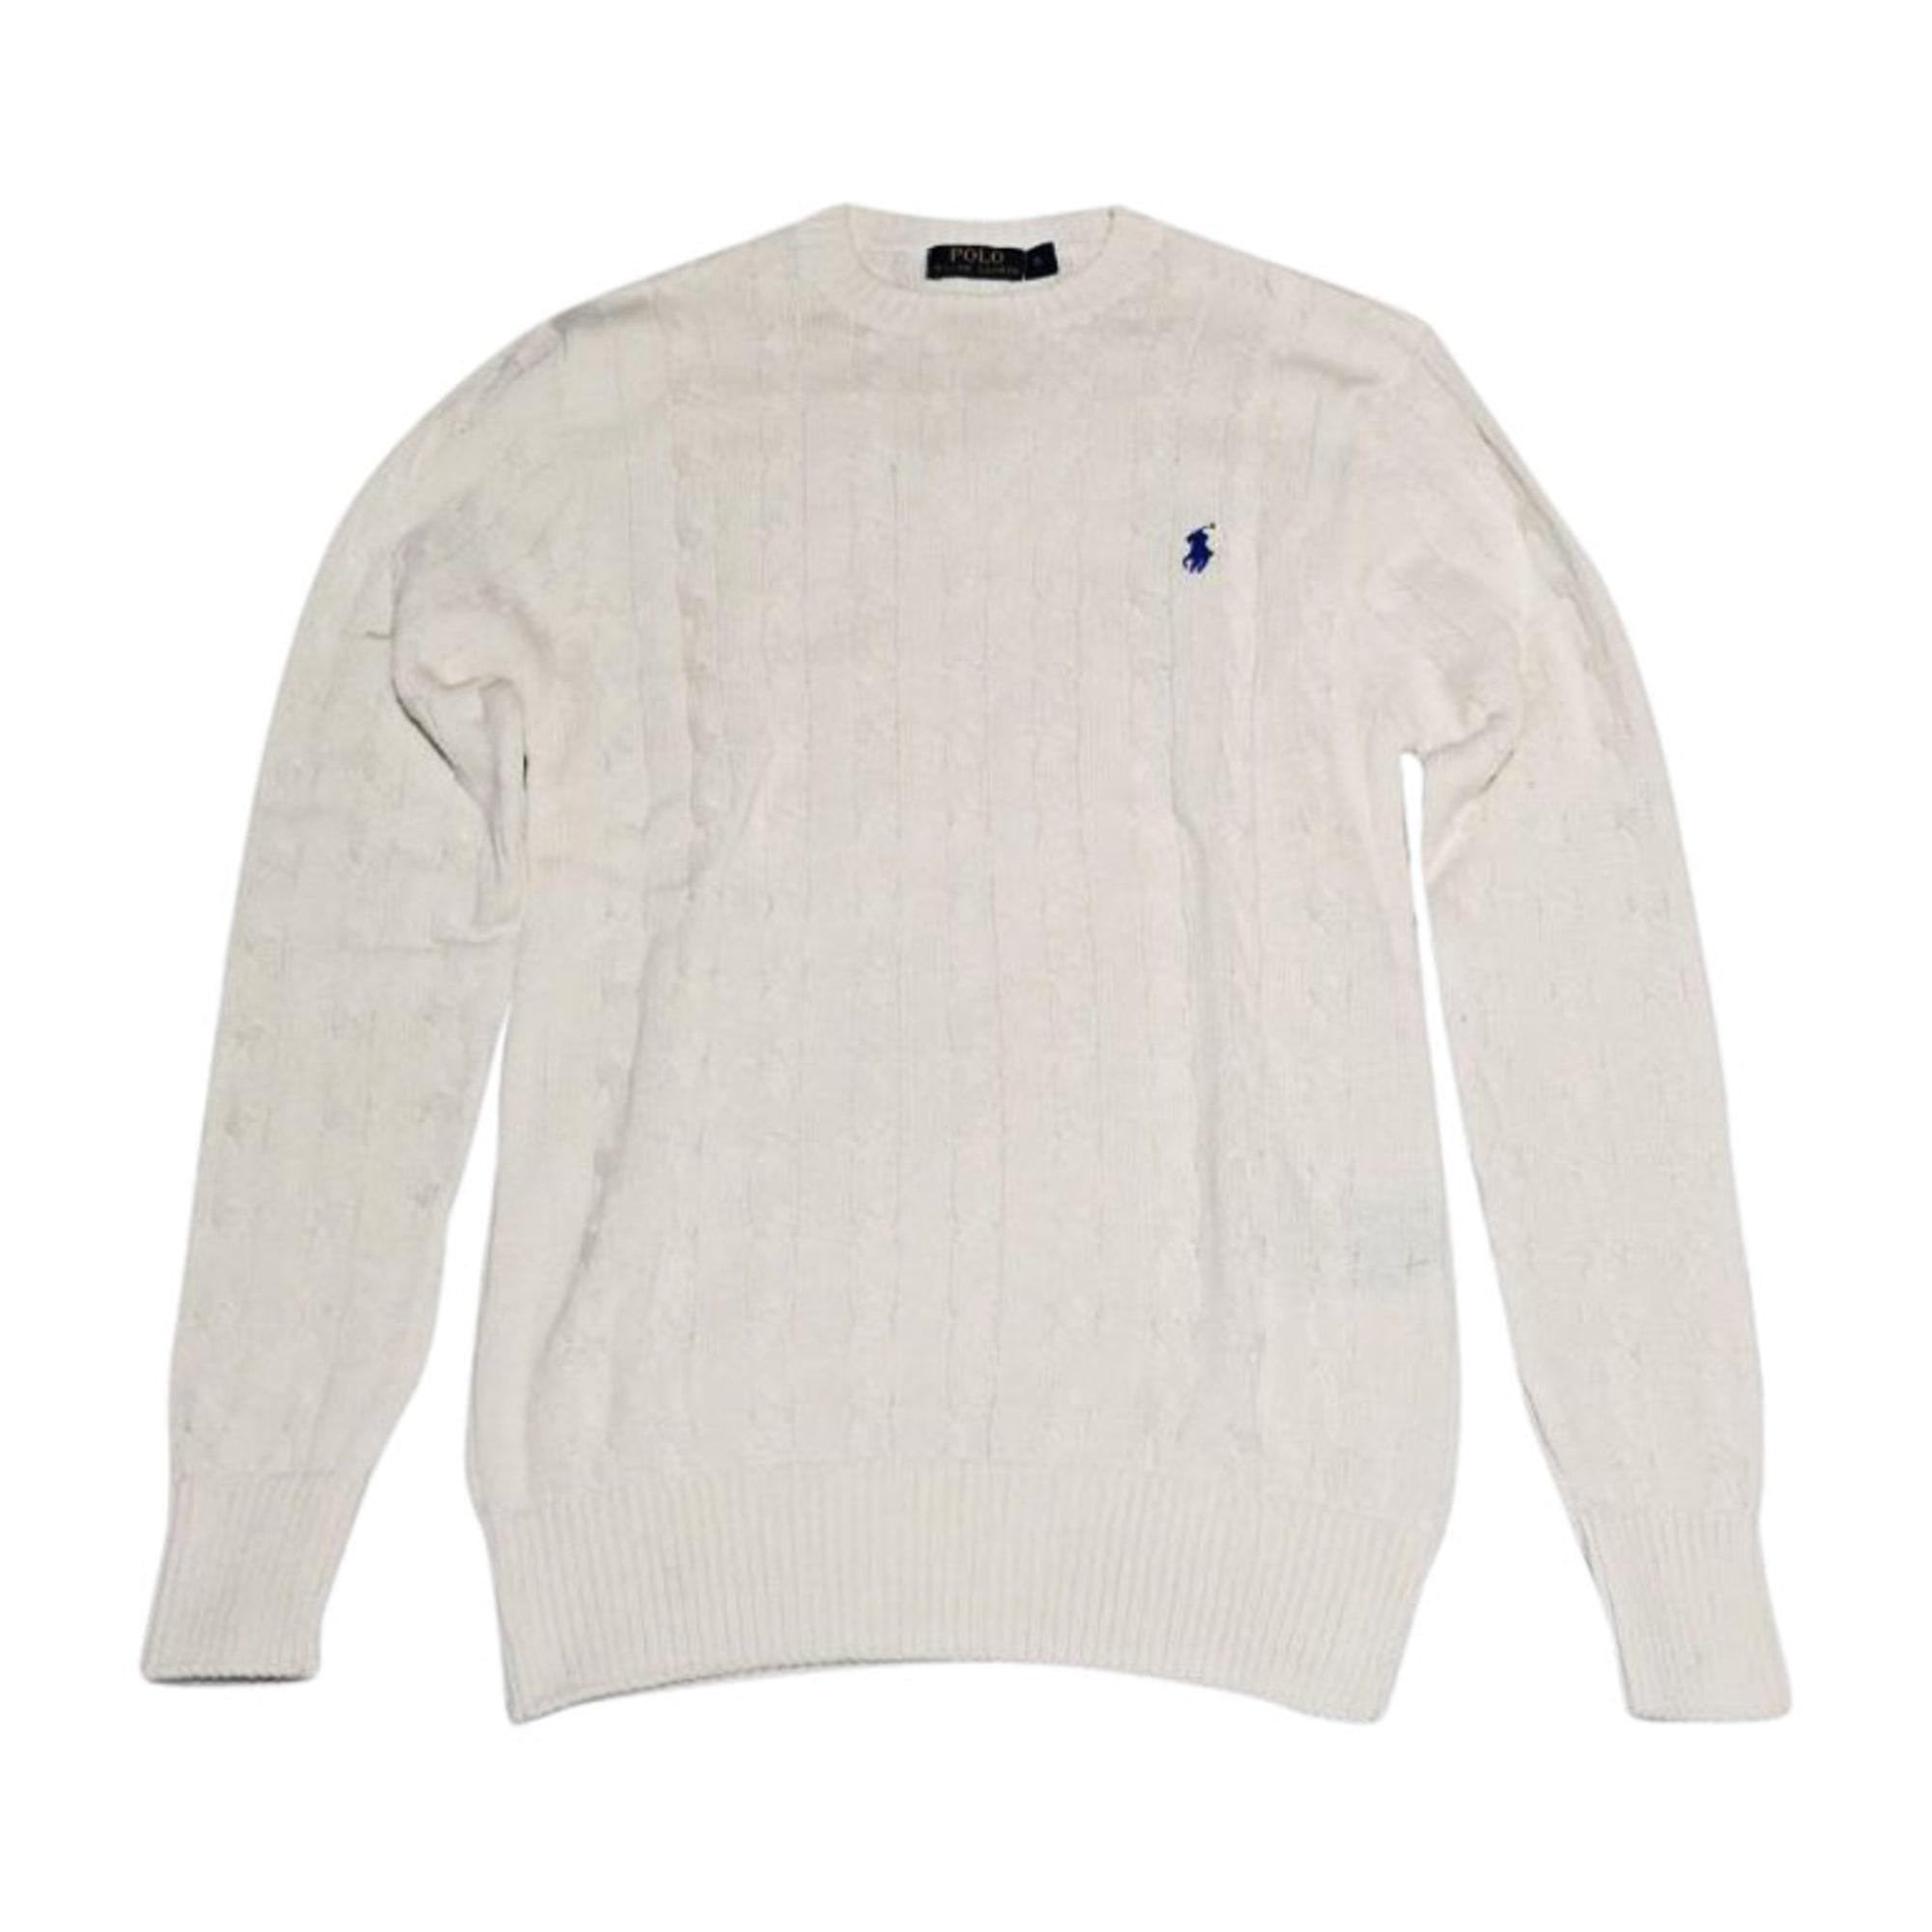 Pull RALPH LAUREN Blanc, blanc cassé, écru 84559c75540